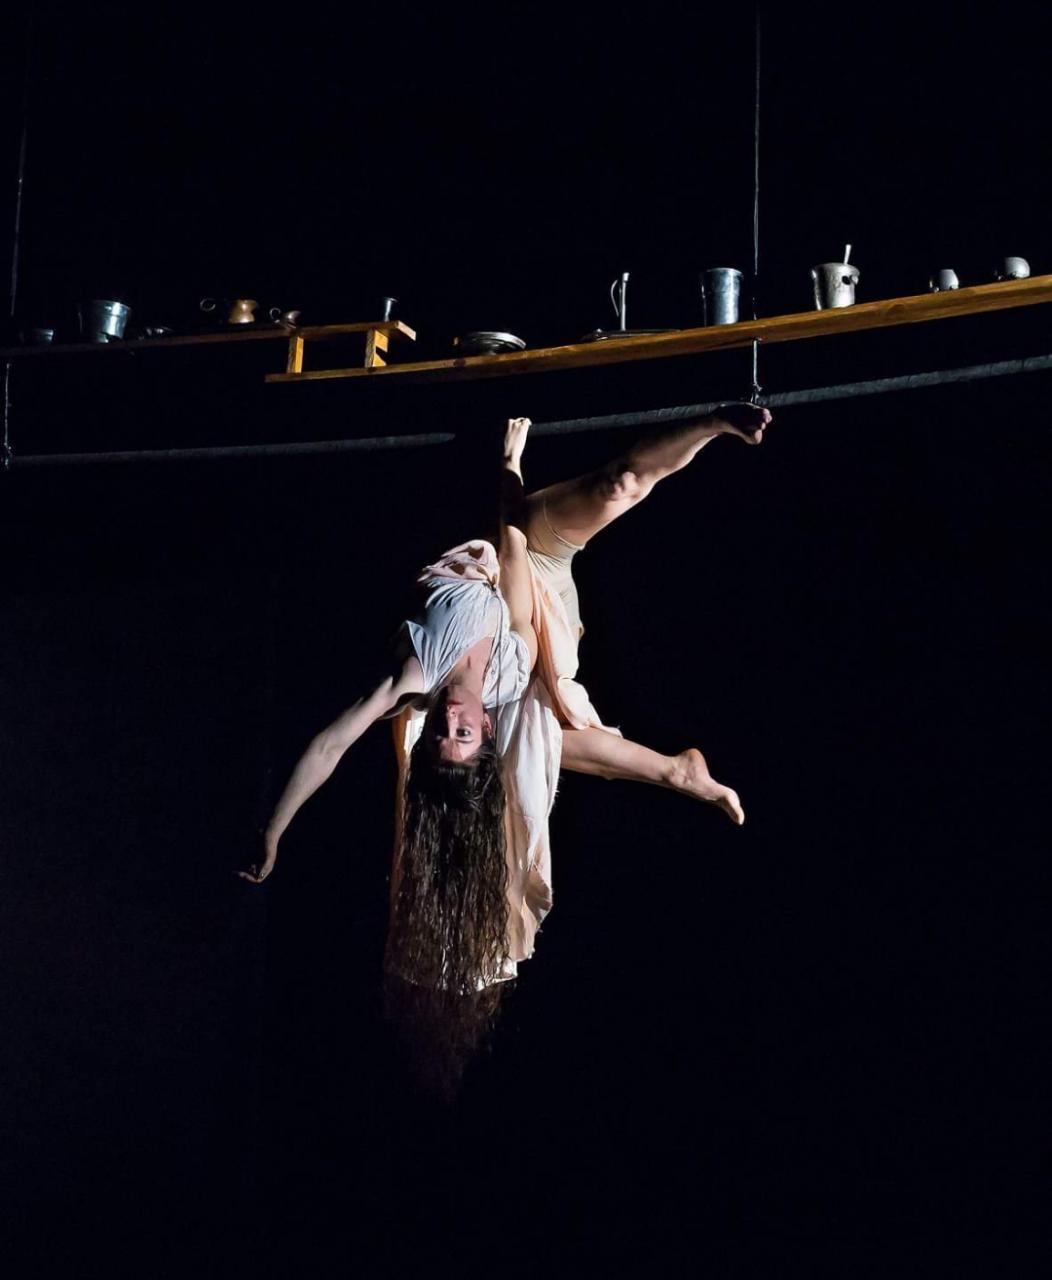 Dance, theater, circus performance?